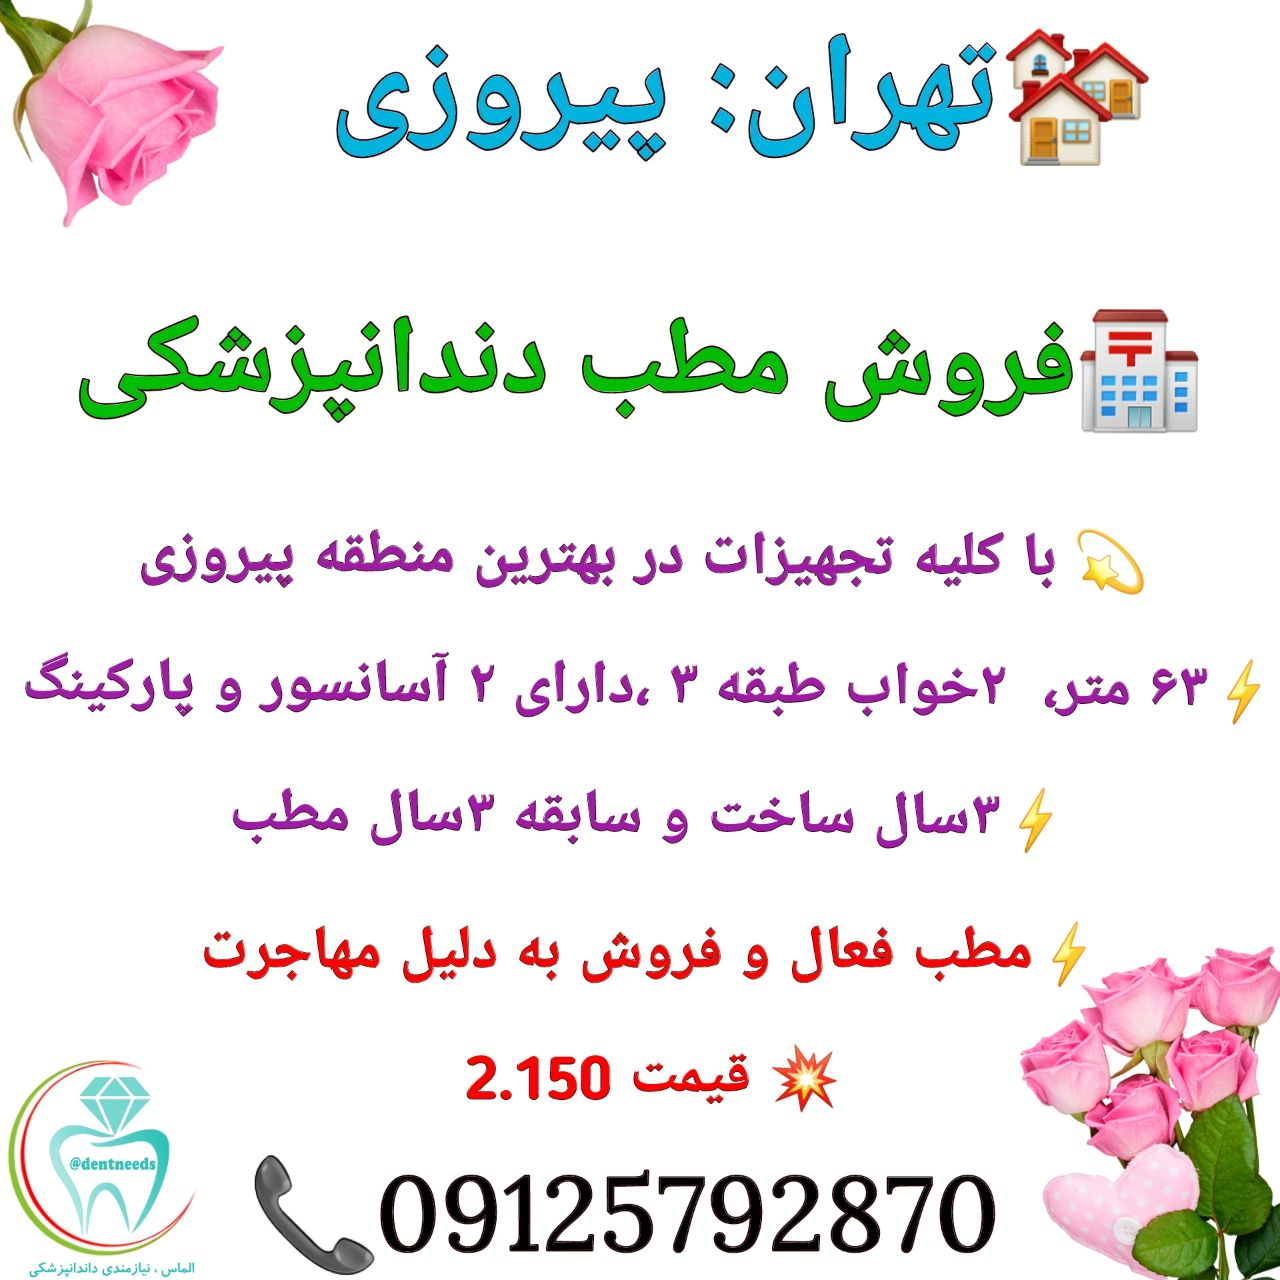 تهران: پیروزی، فروش مطب دندانپزشکی